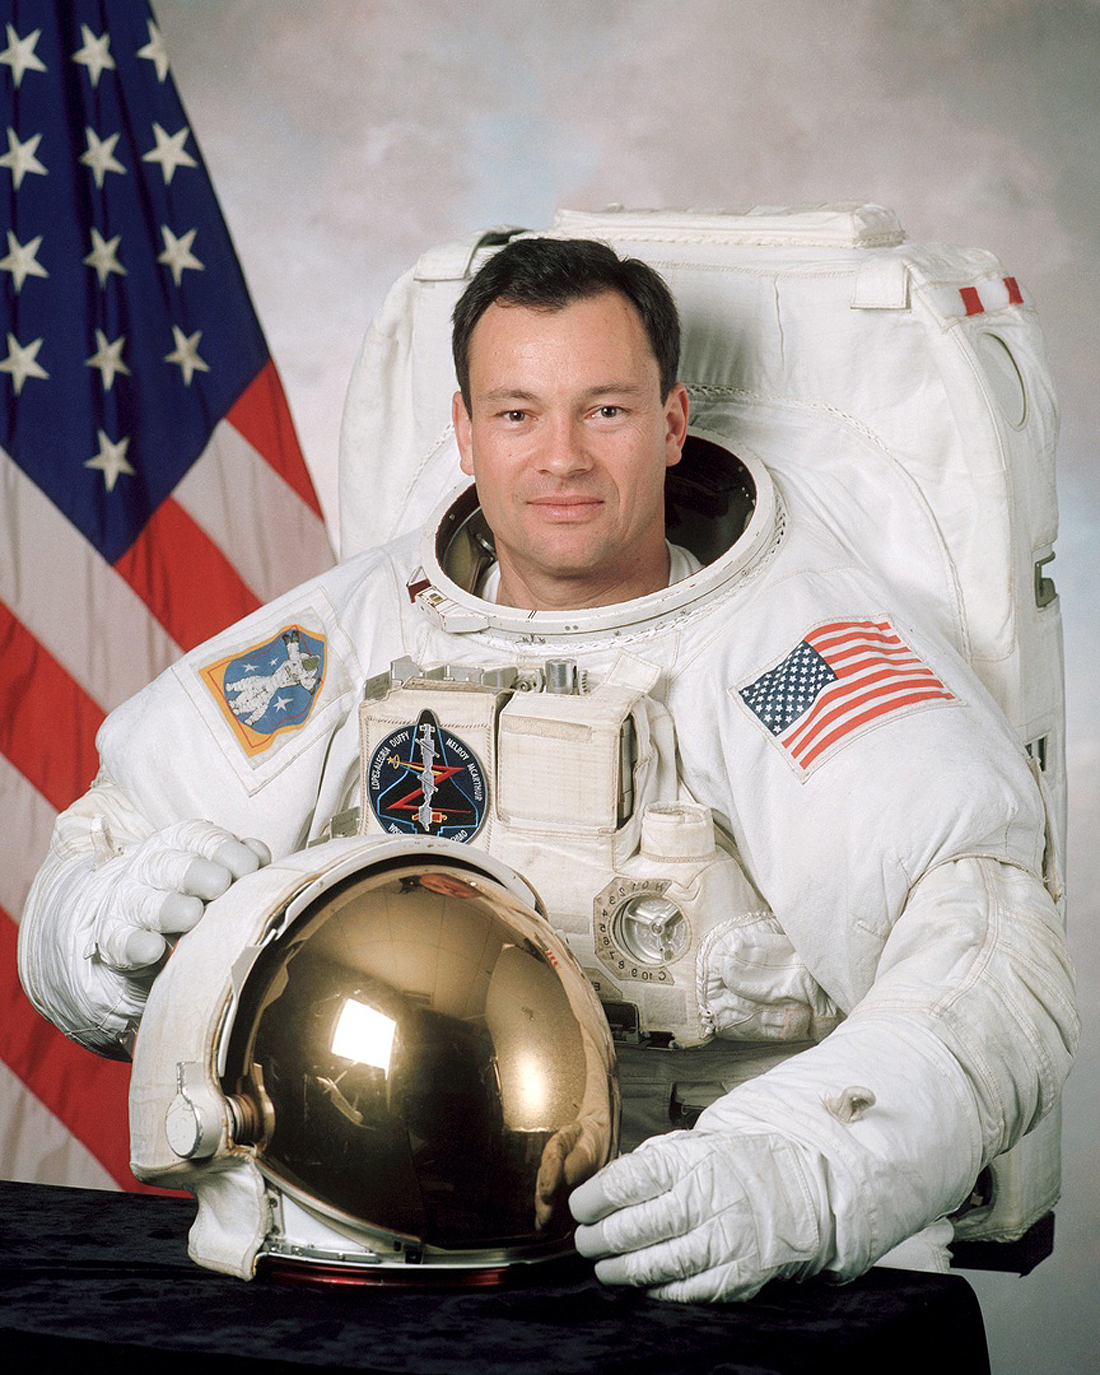 Axiom astronaut Michael Lopez-Alegria